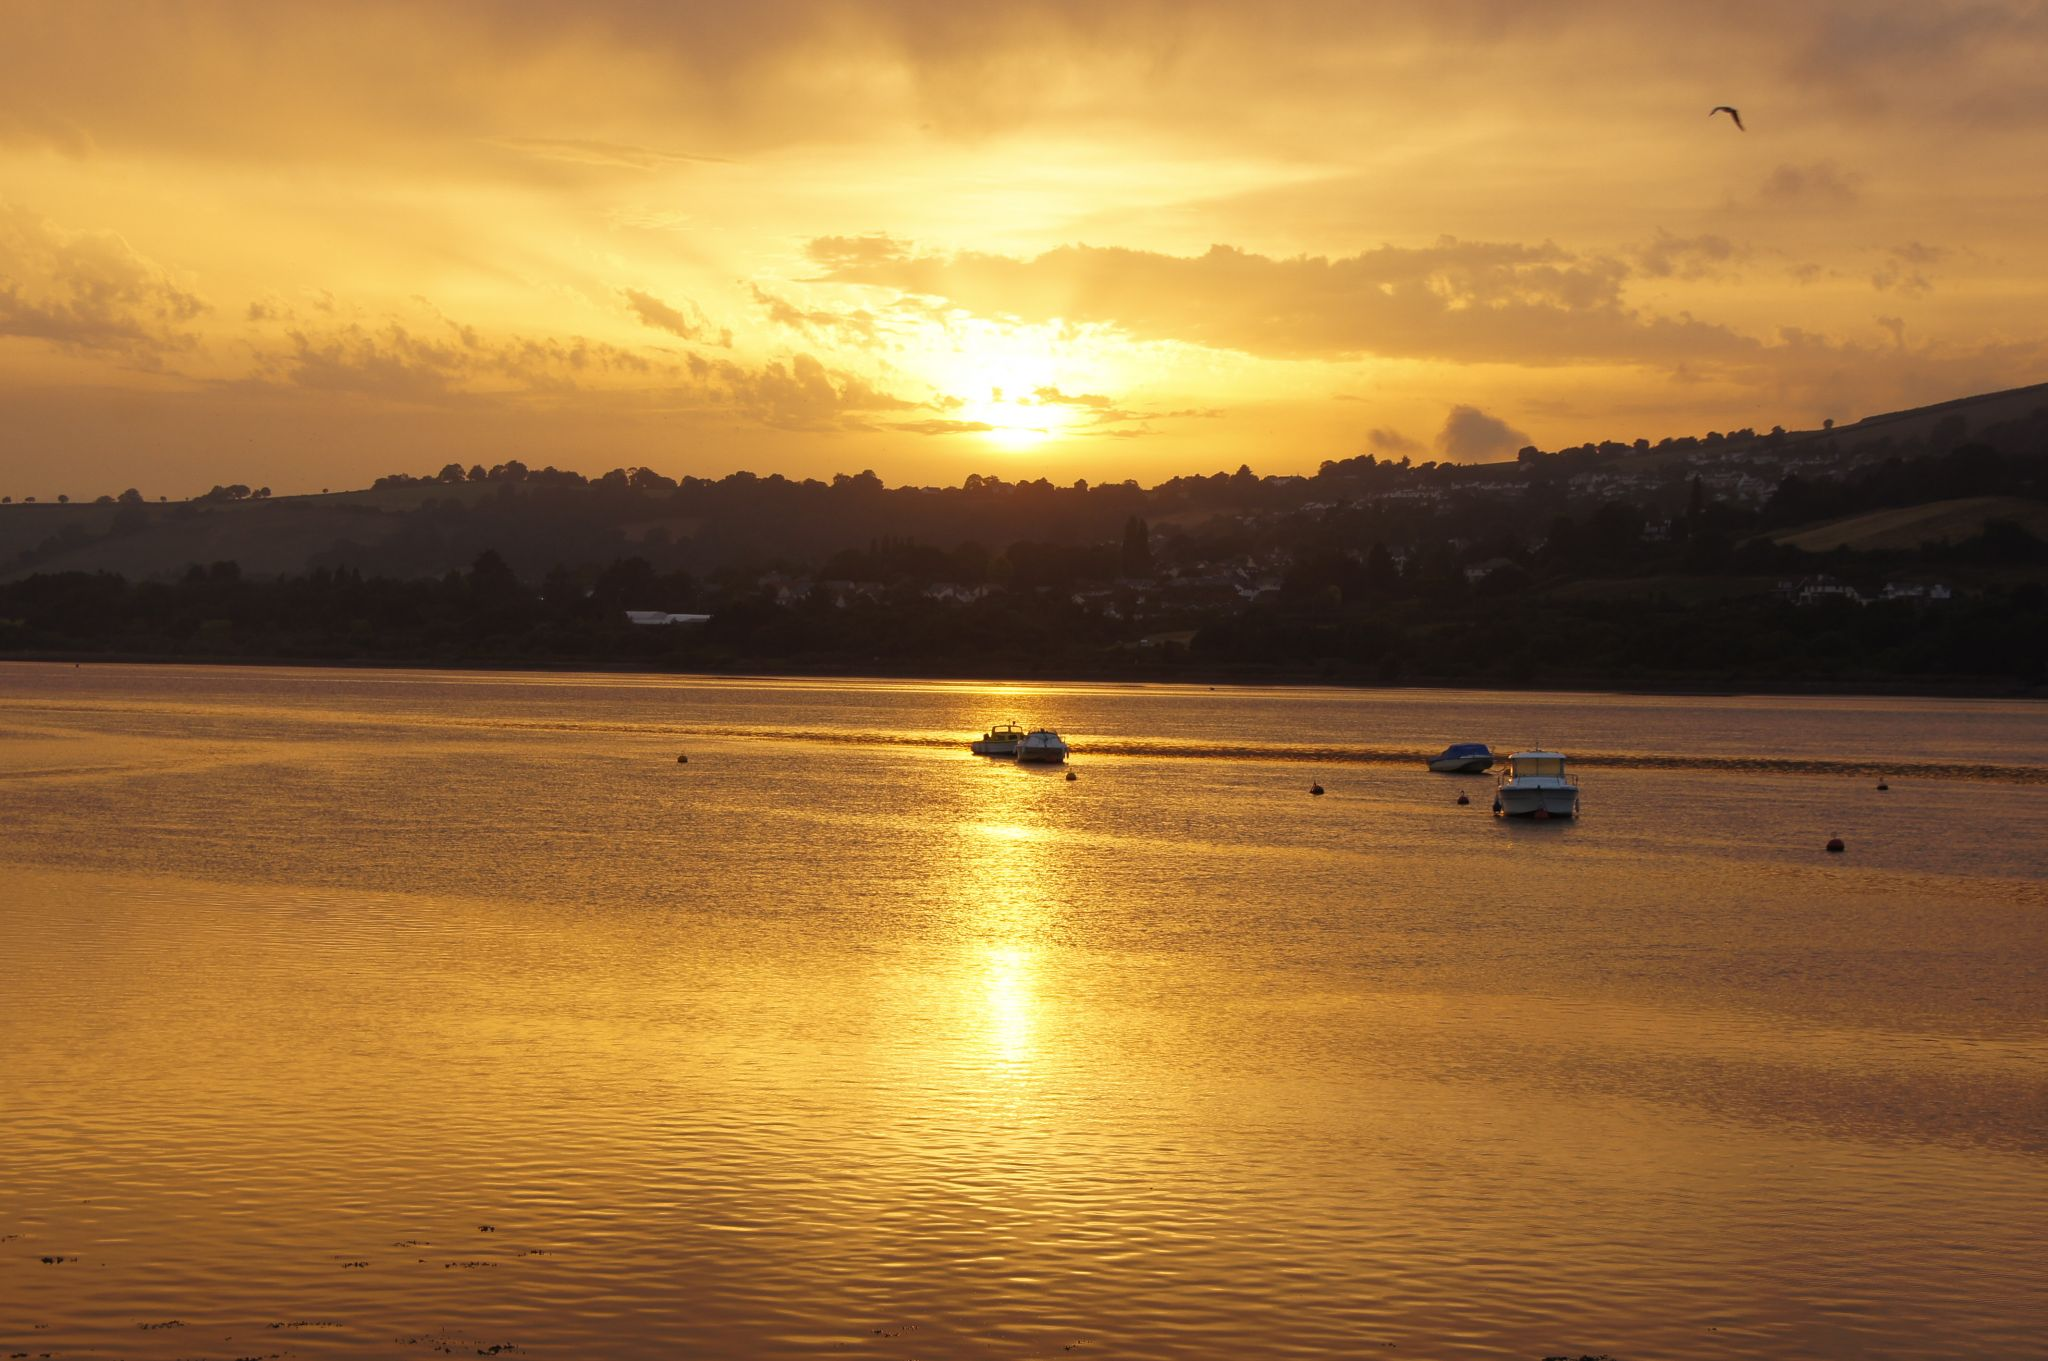 Sunset over river Teign, United Kingdom